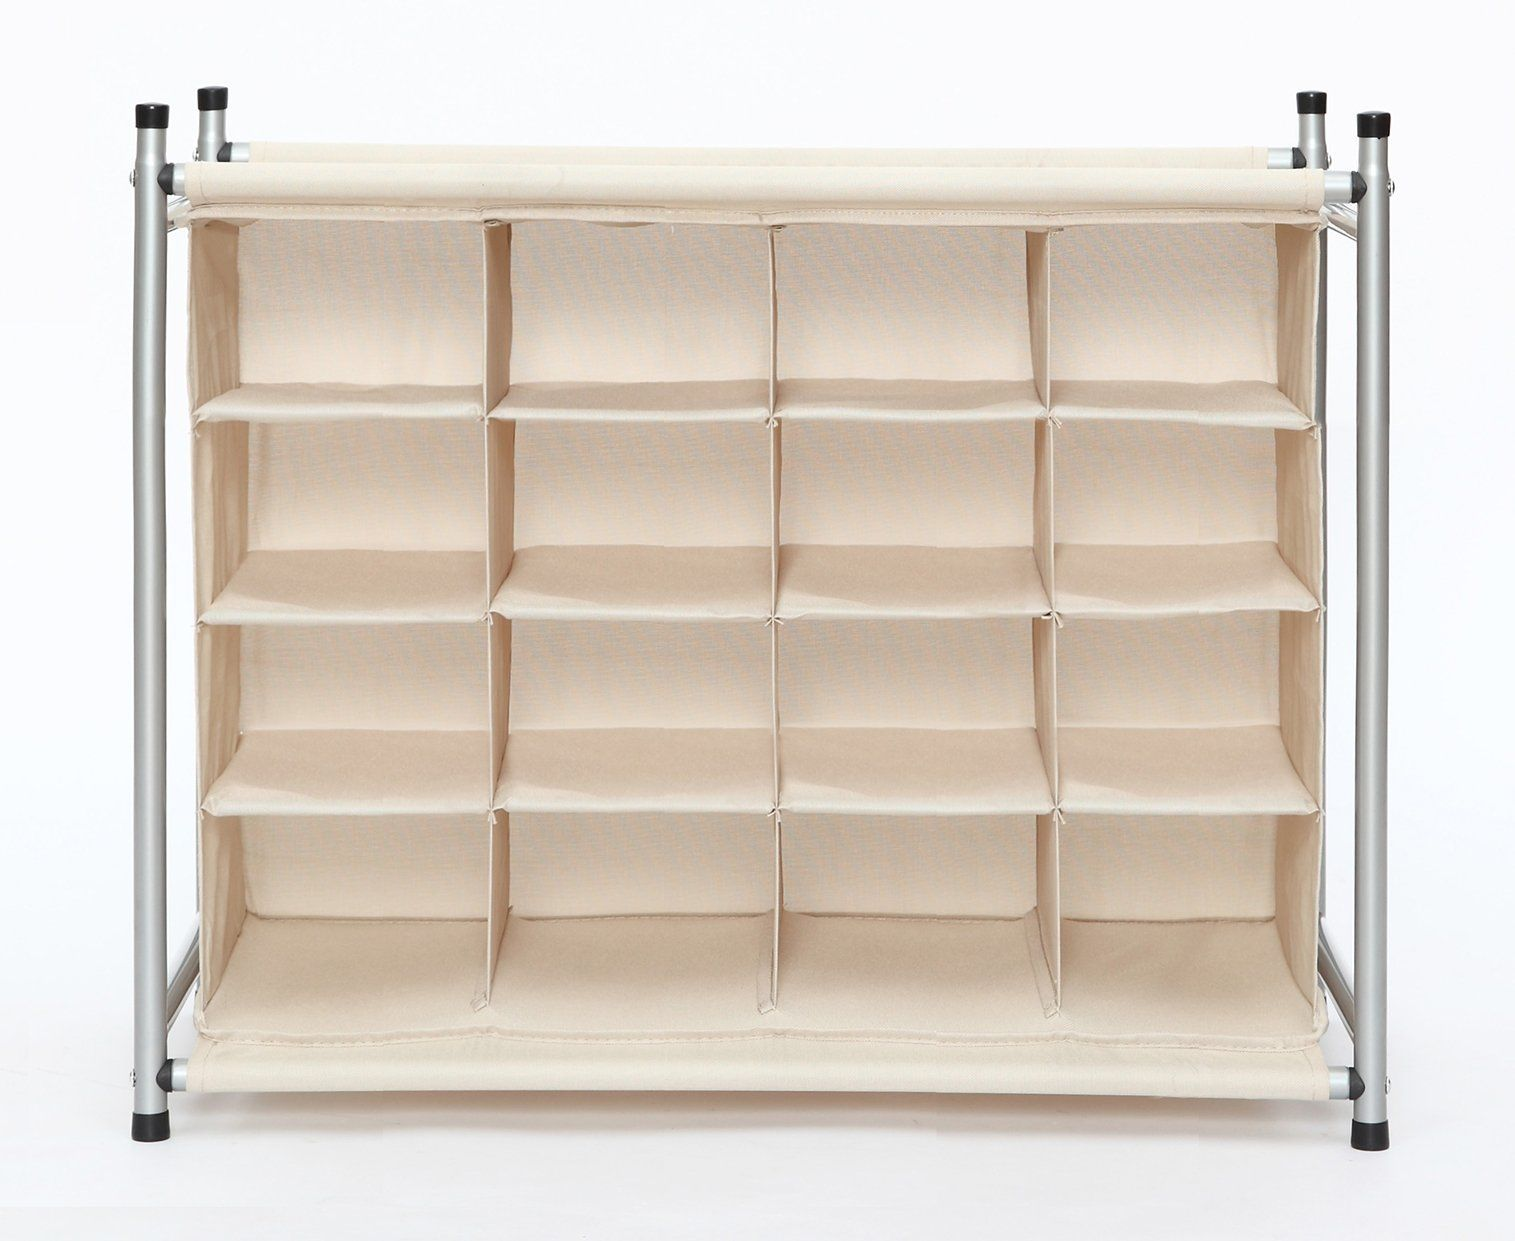 Storage Maniac 4 Tier 16 Cube Stackable Shoe Rack Organizer Free